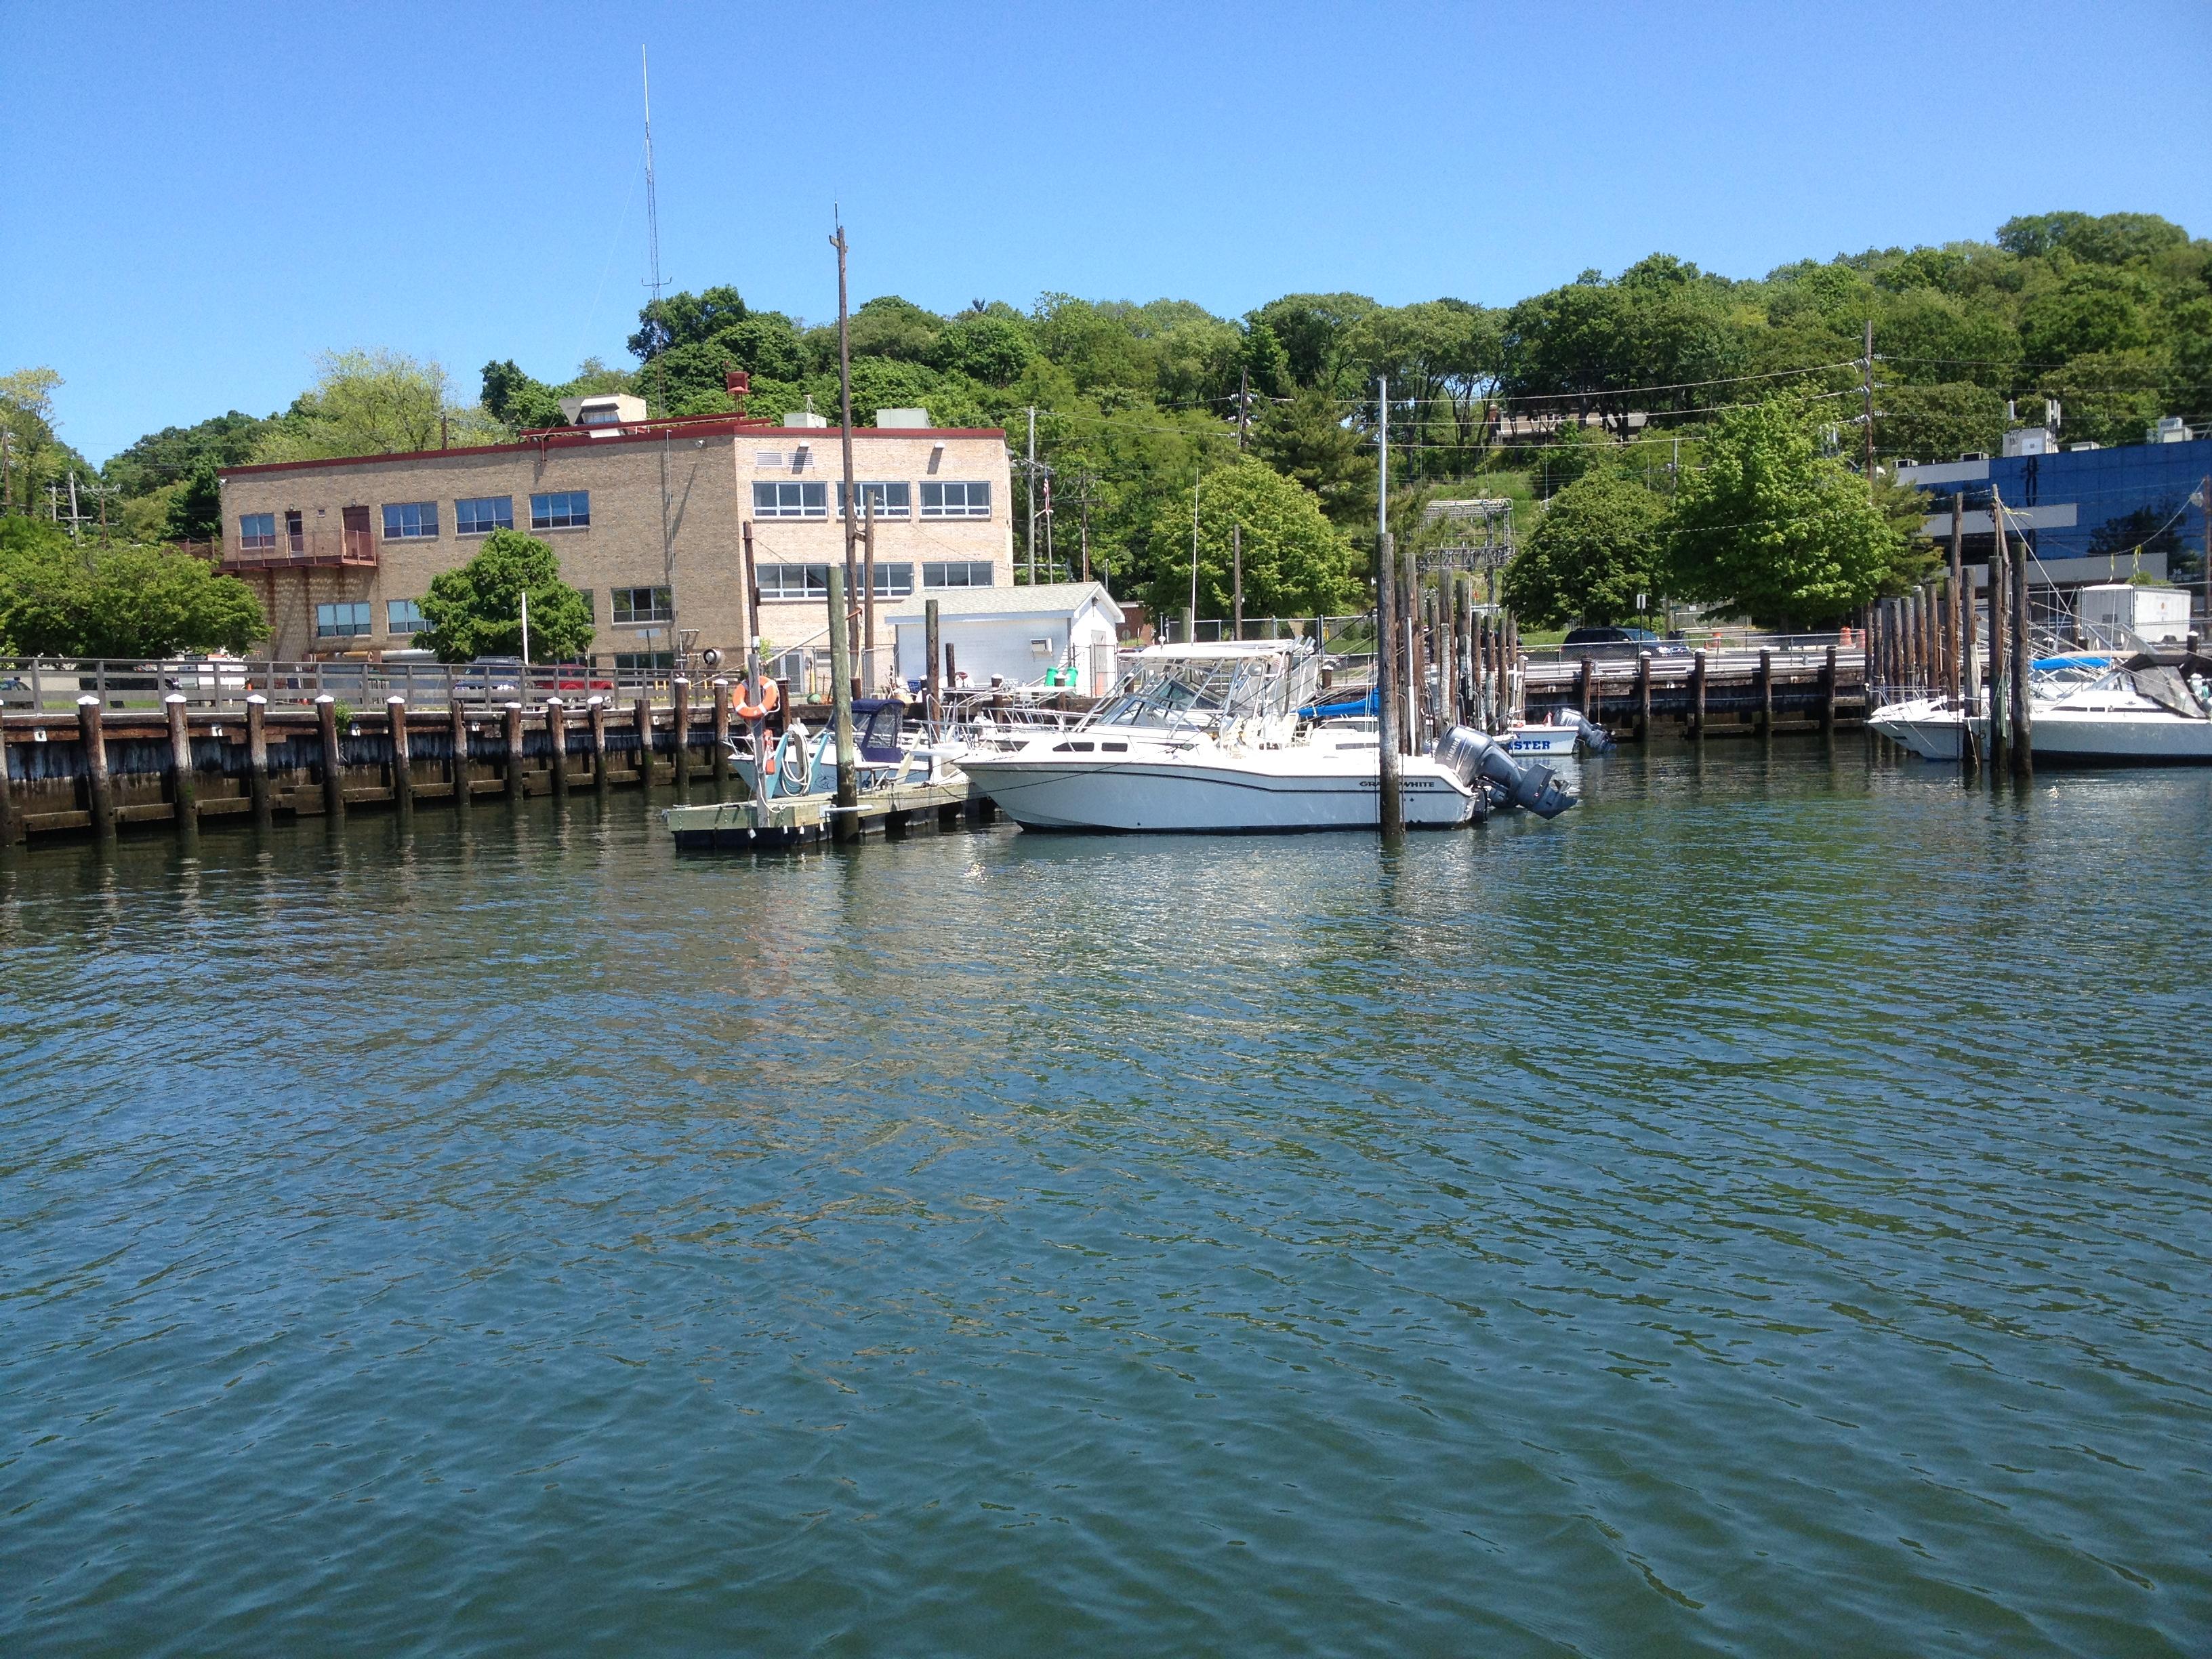 2012-05-19 Huntington Harbor Cruise 12.jpg